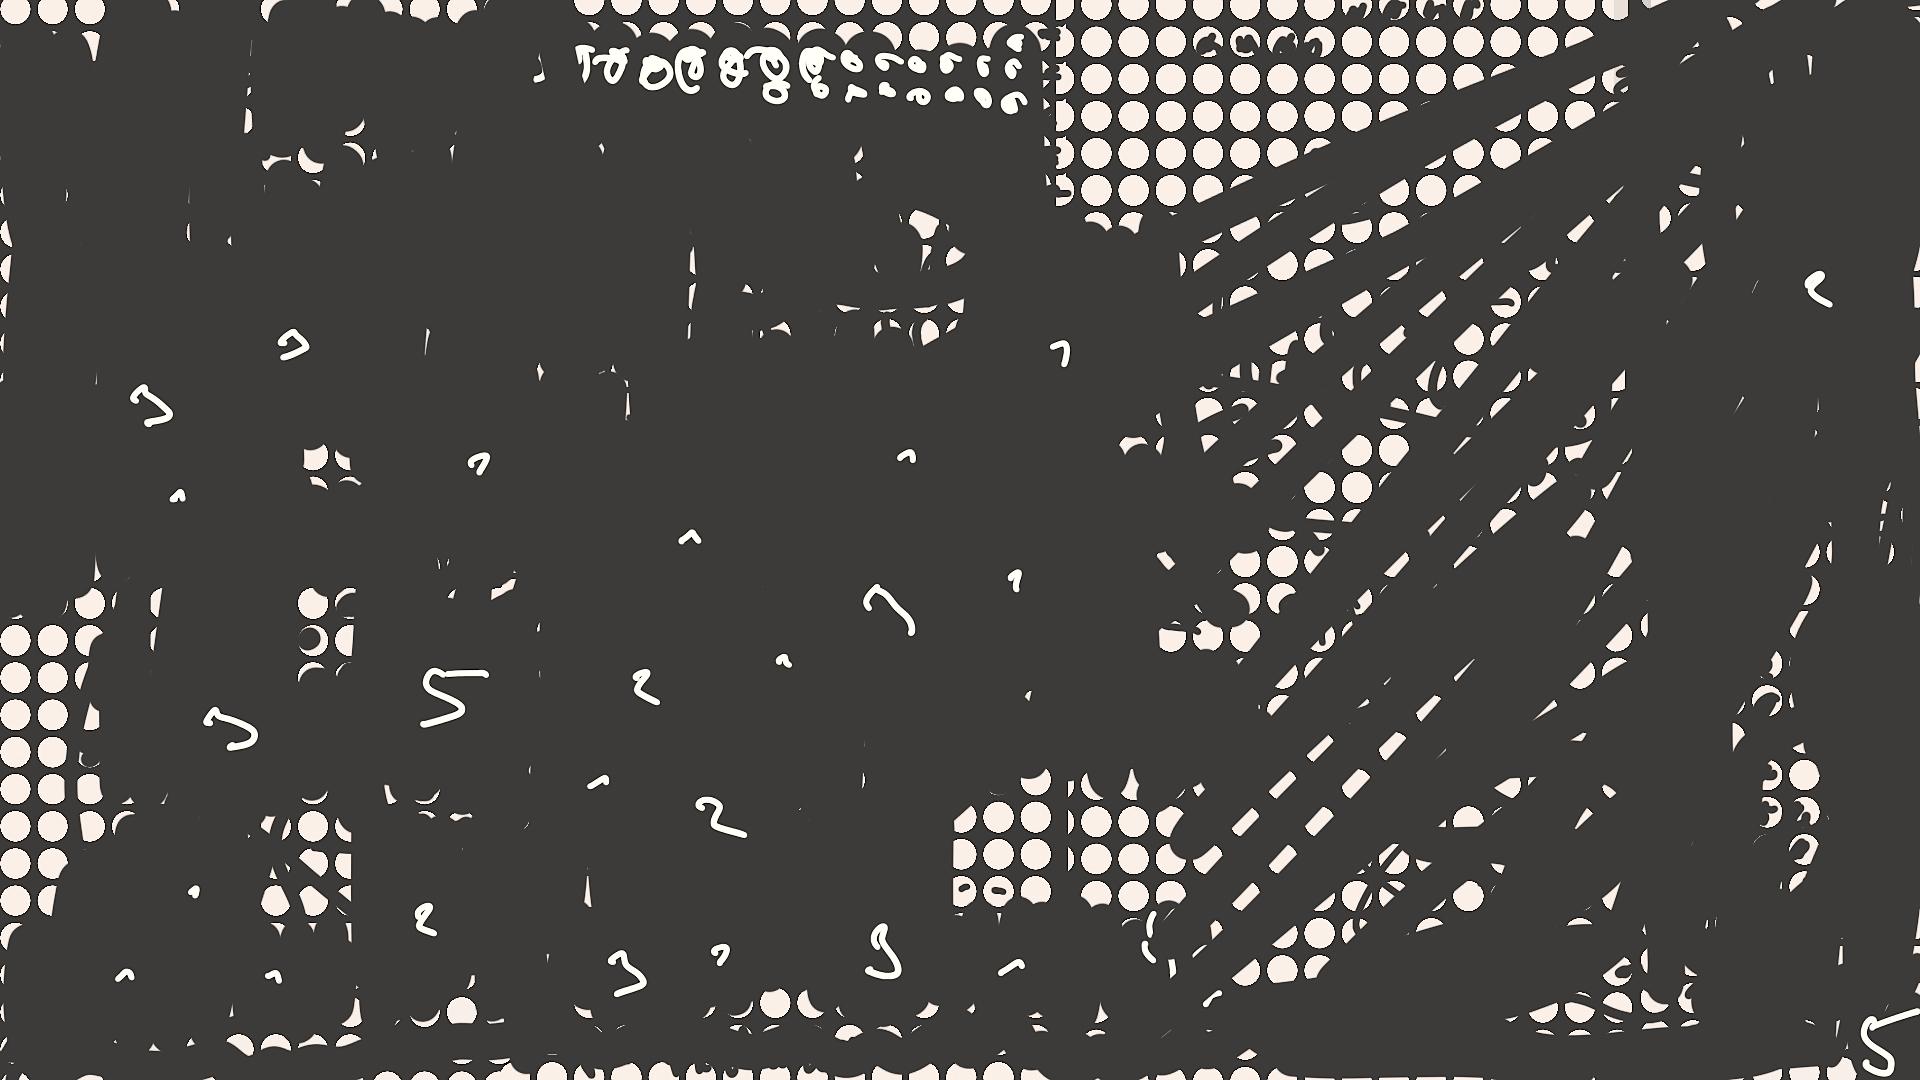 Quattuor Novissima (Symphony N2) The Beautiful Formula Collective, 2018 Michael Gene Aichner, Daniel Geiger, Oleksiy Koval, Veronika Wenger Full HD projection Art Fair Tüyap, Istanbul